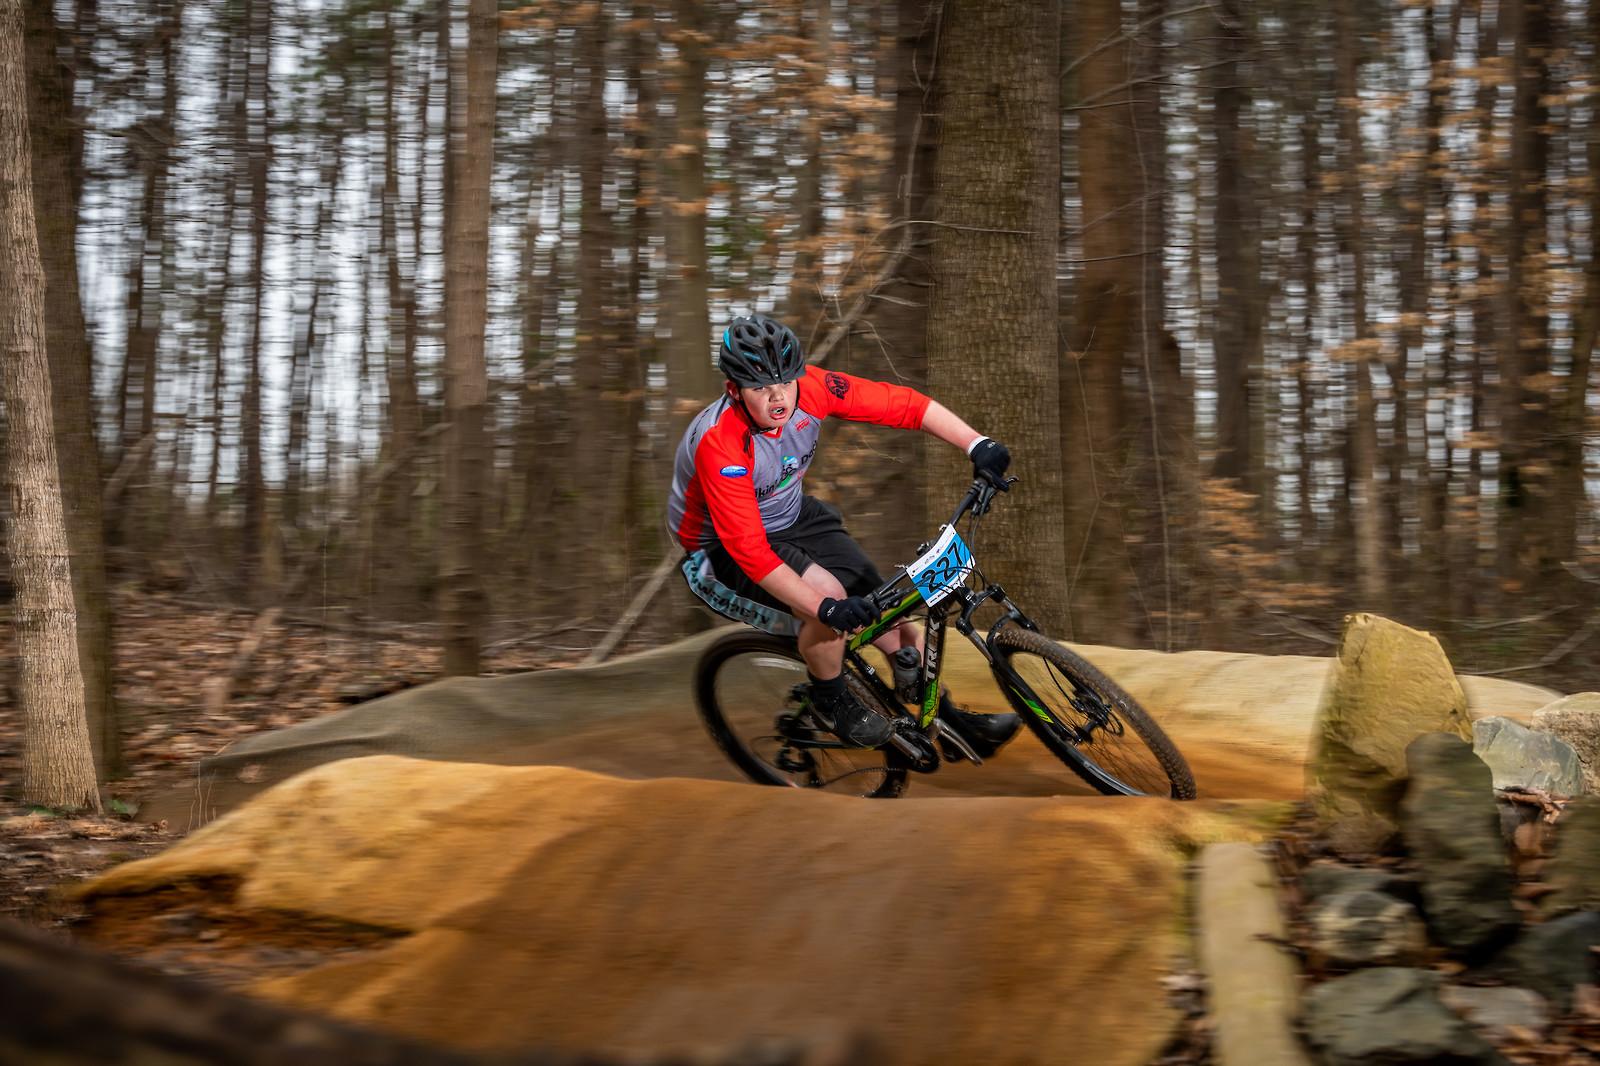 Jaydon - BikinDad - Mountain Biking Pictures - Vital MTB